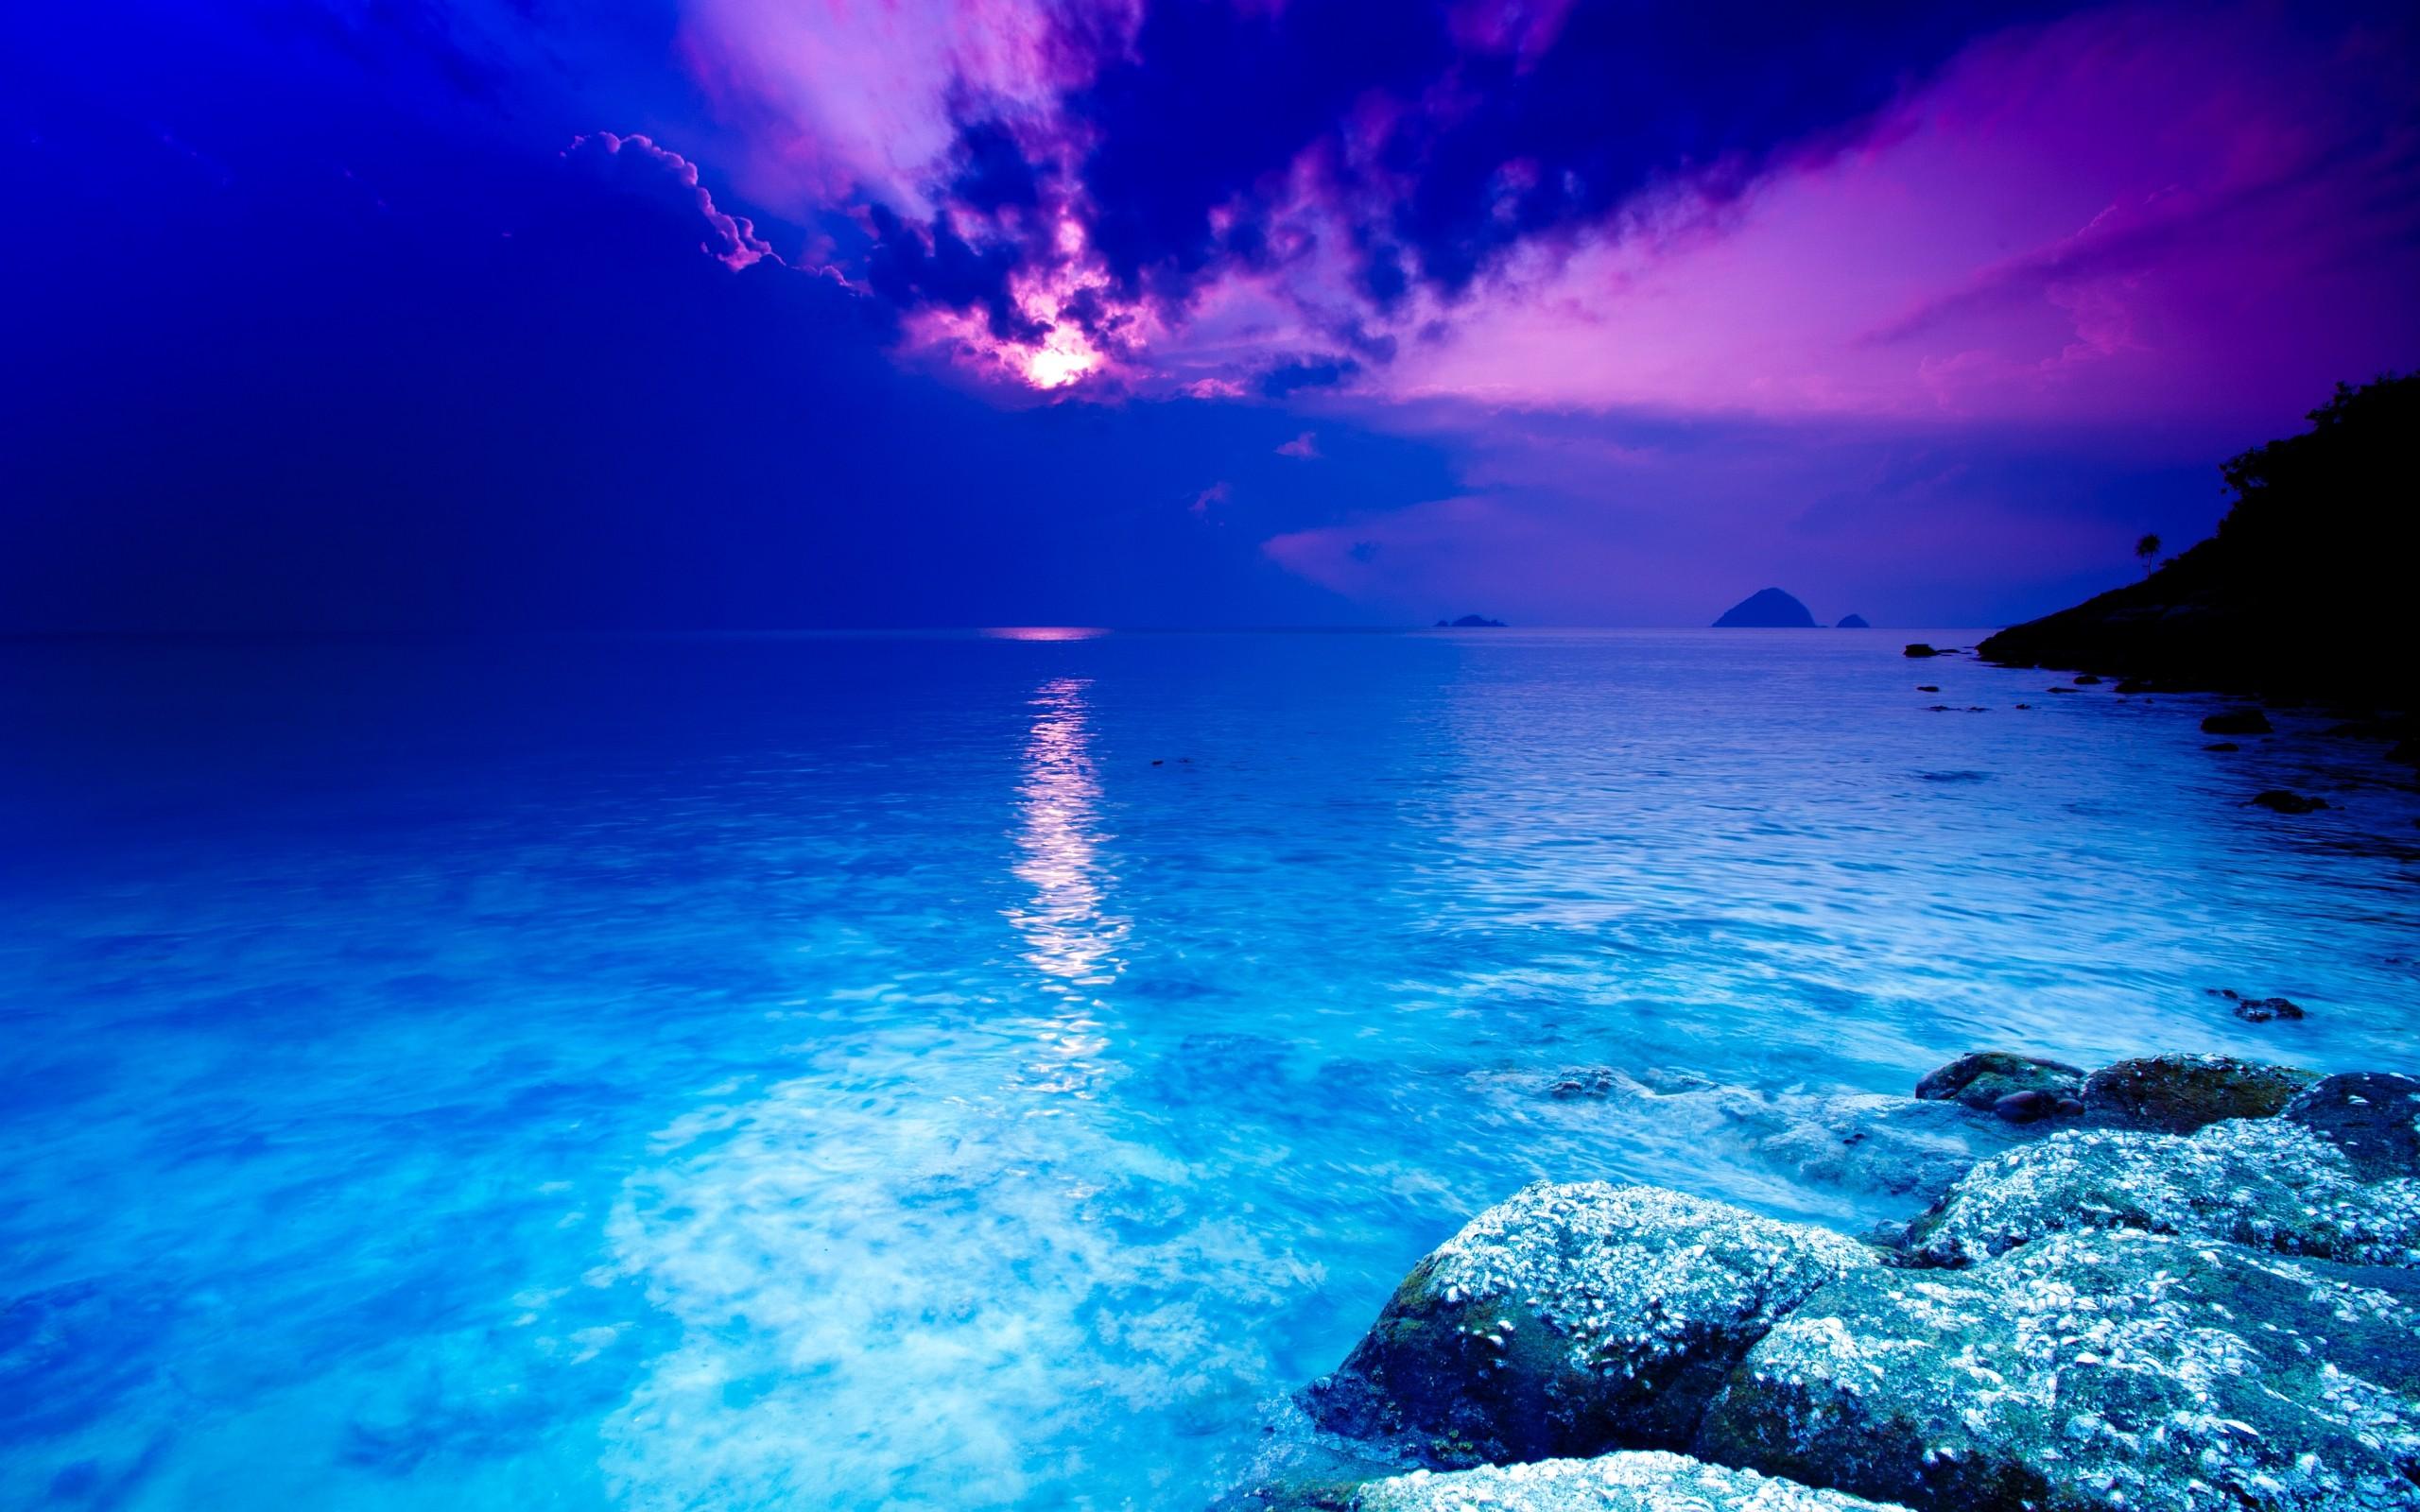 Blue Sea Wallpaper 2560x1600 Blue Sea Crystal Thailand 2560x1600